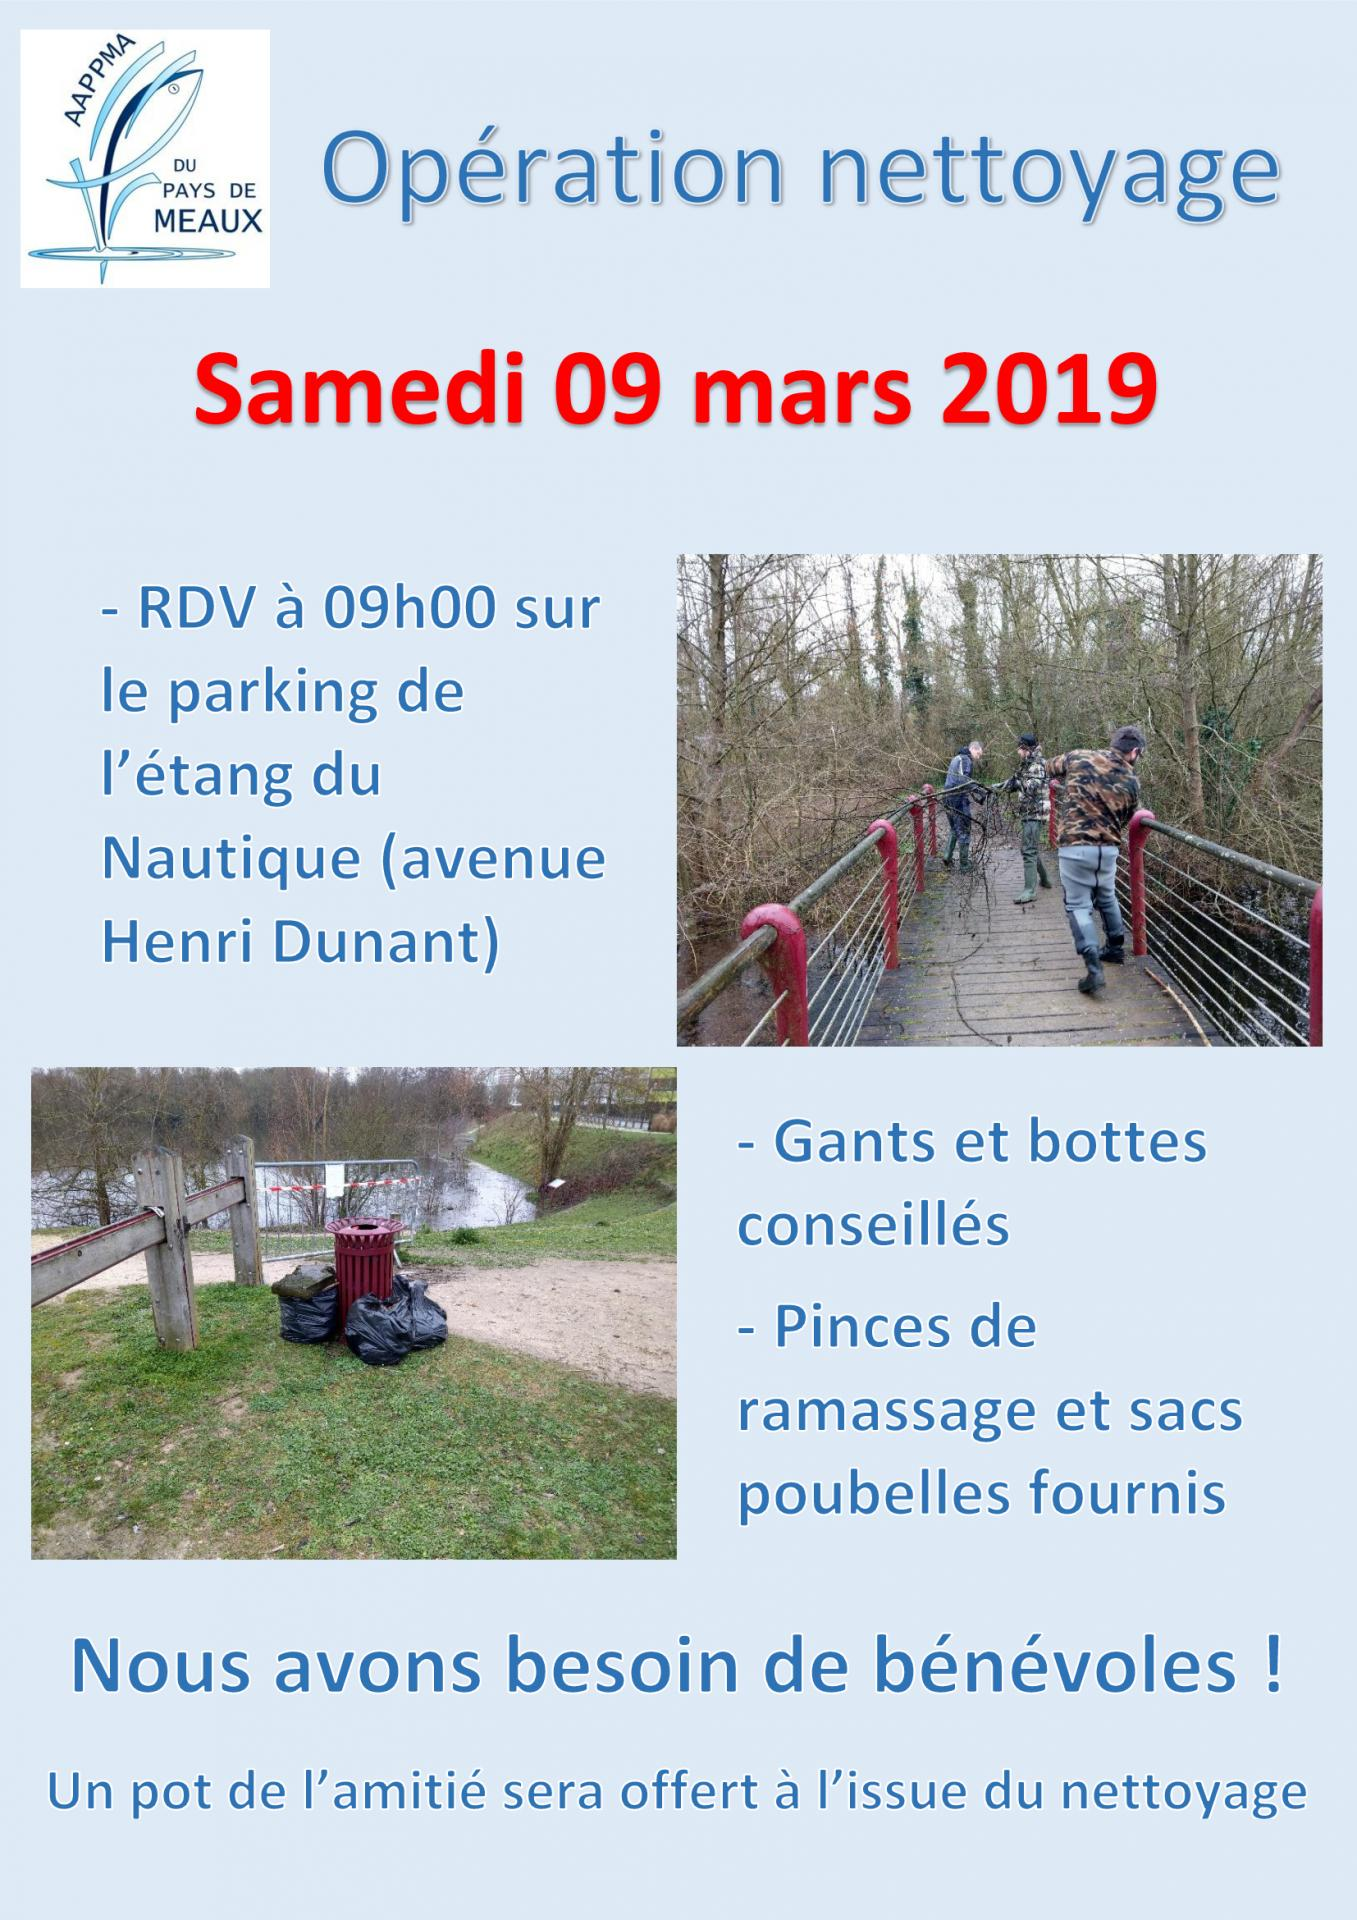 Affiche nettoyage 09 mars 2019